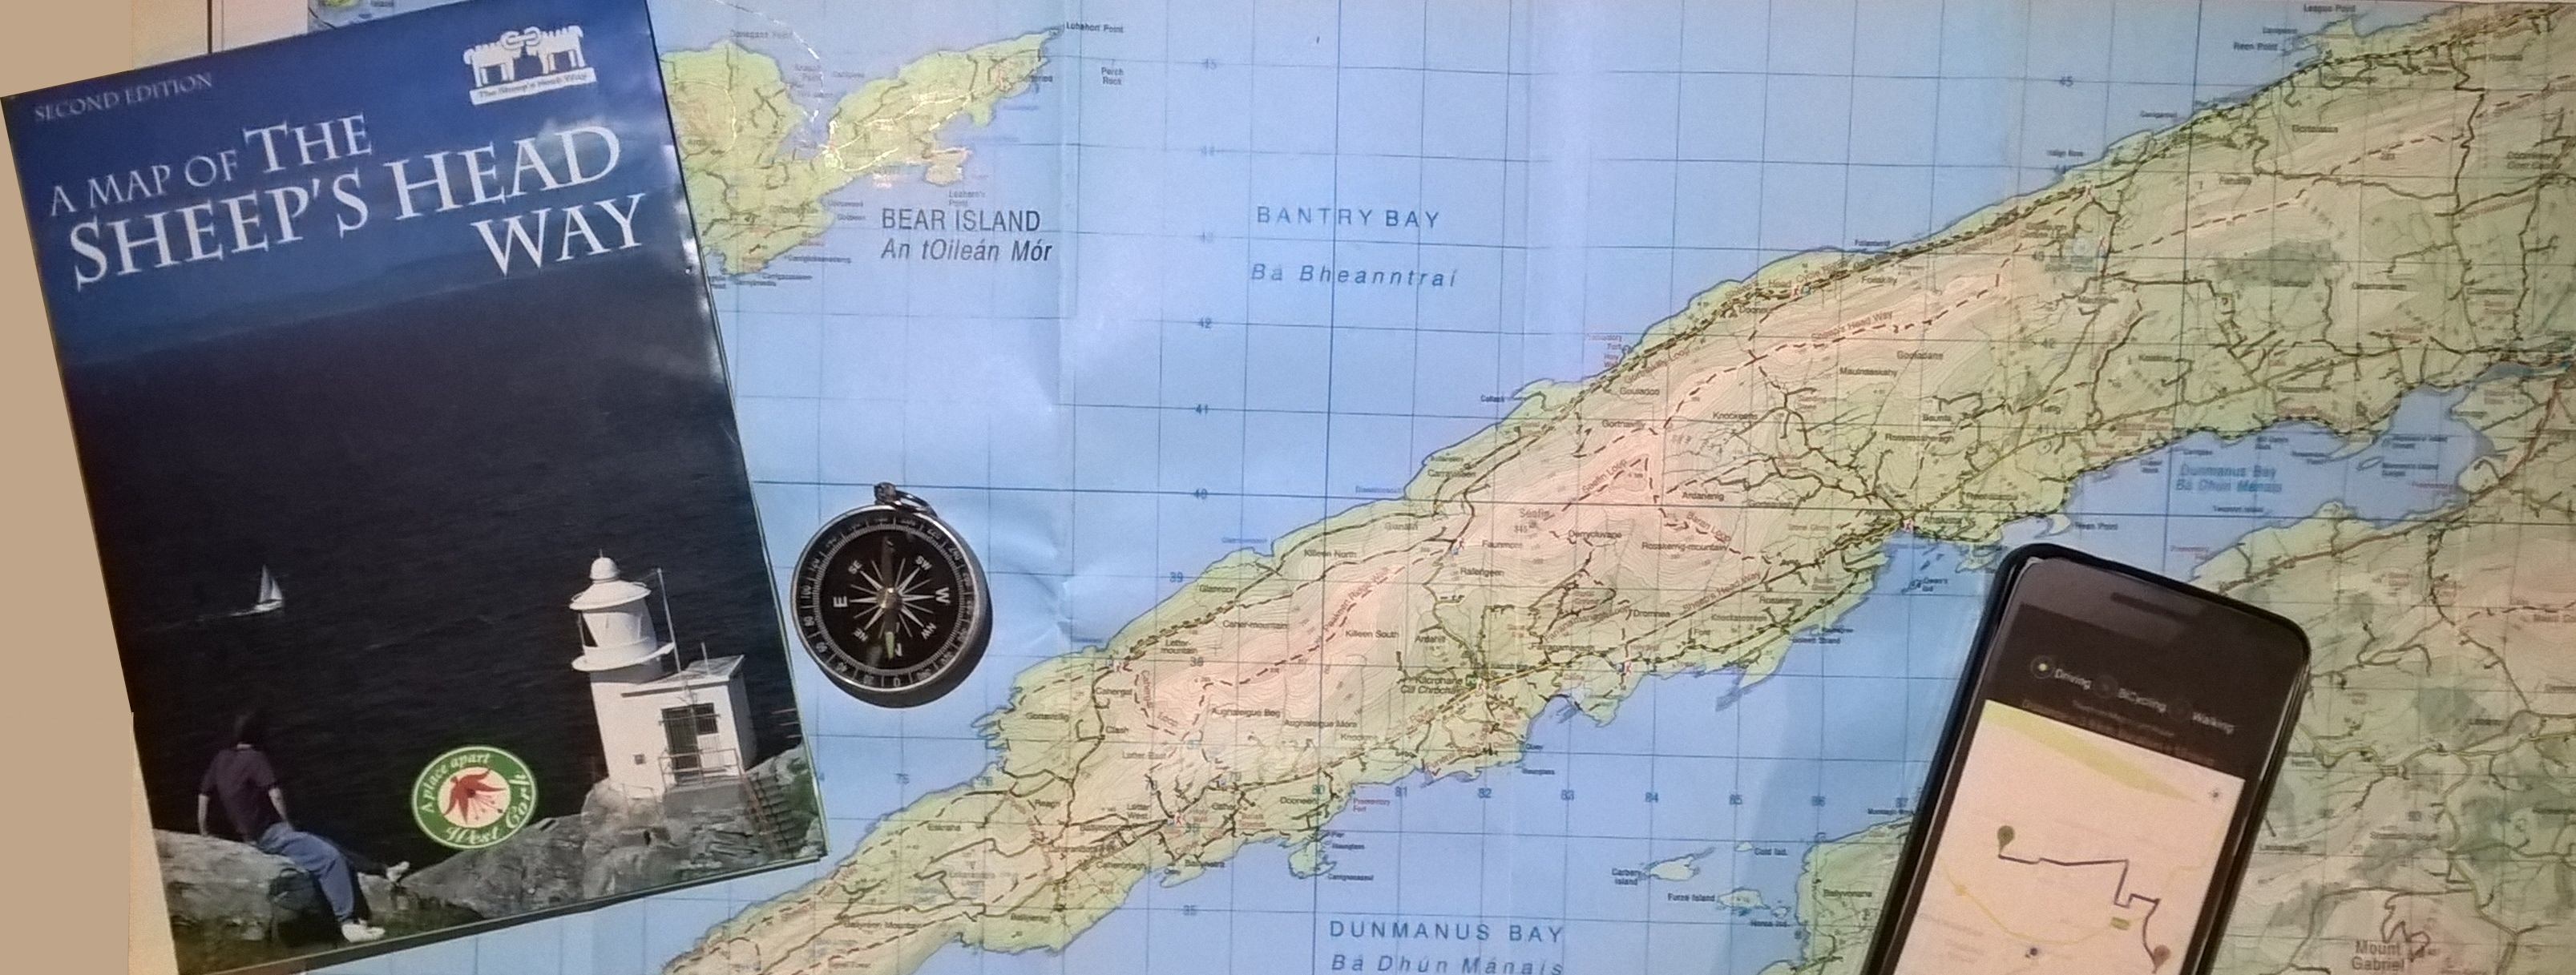 Maps & GPS